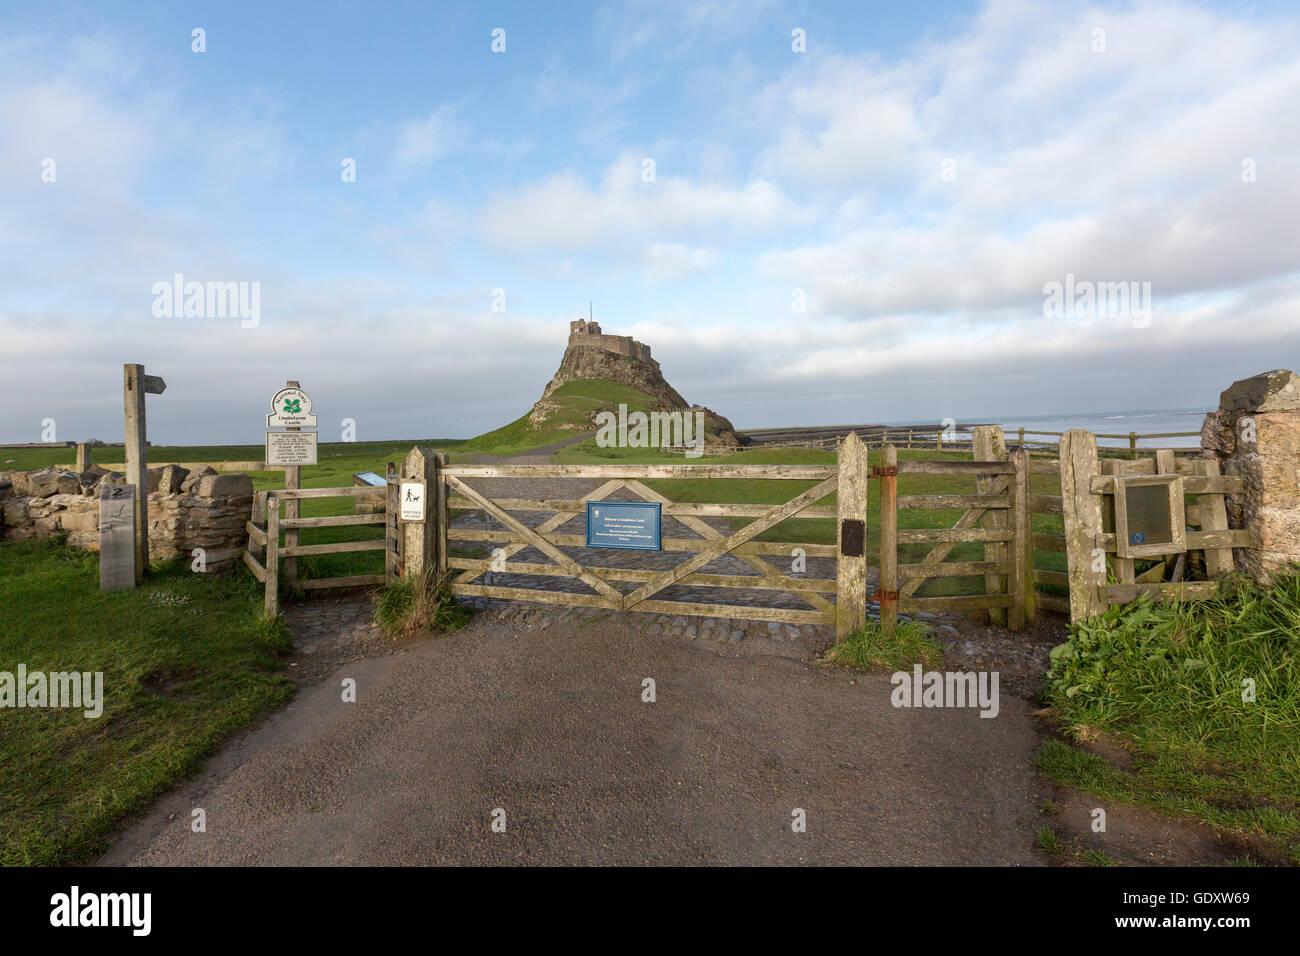 Field gate and ehe Holy Island of Lindisfarne castle, Northumberland, England, UK - Stock Image